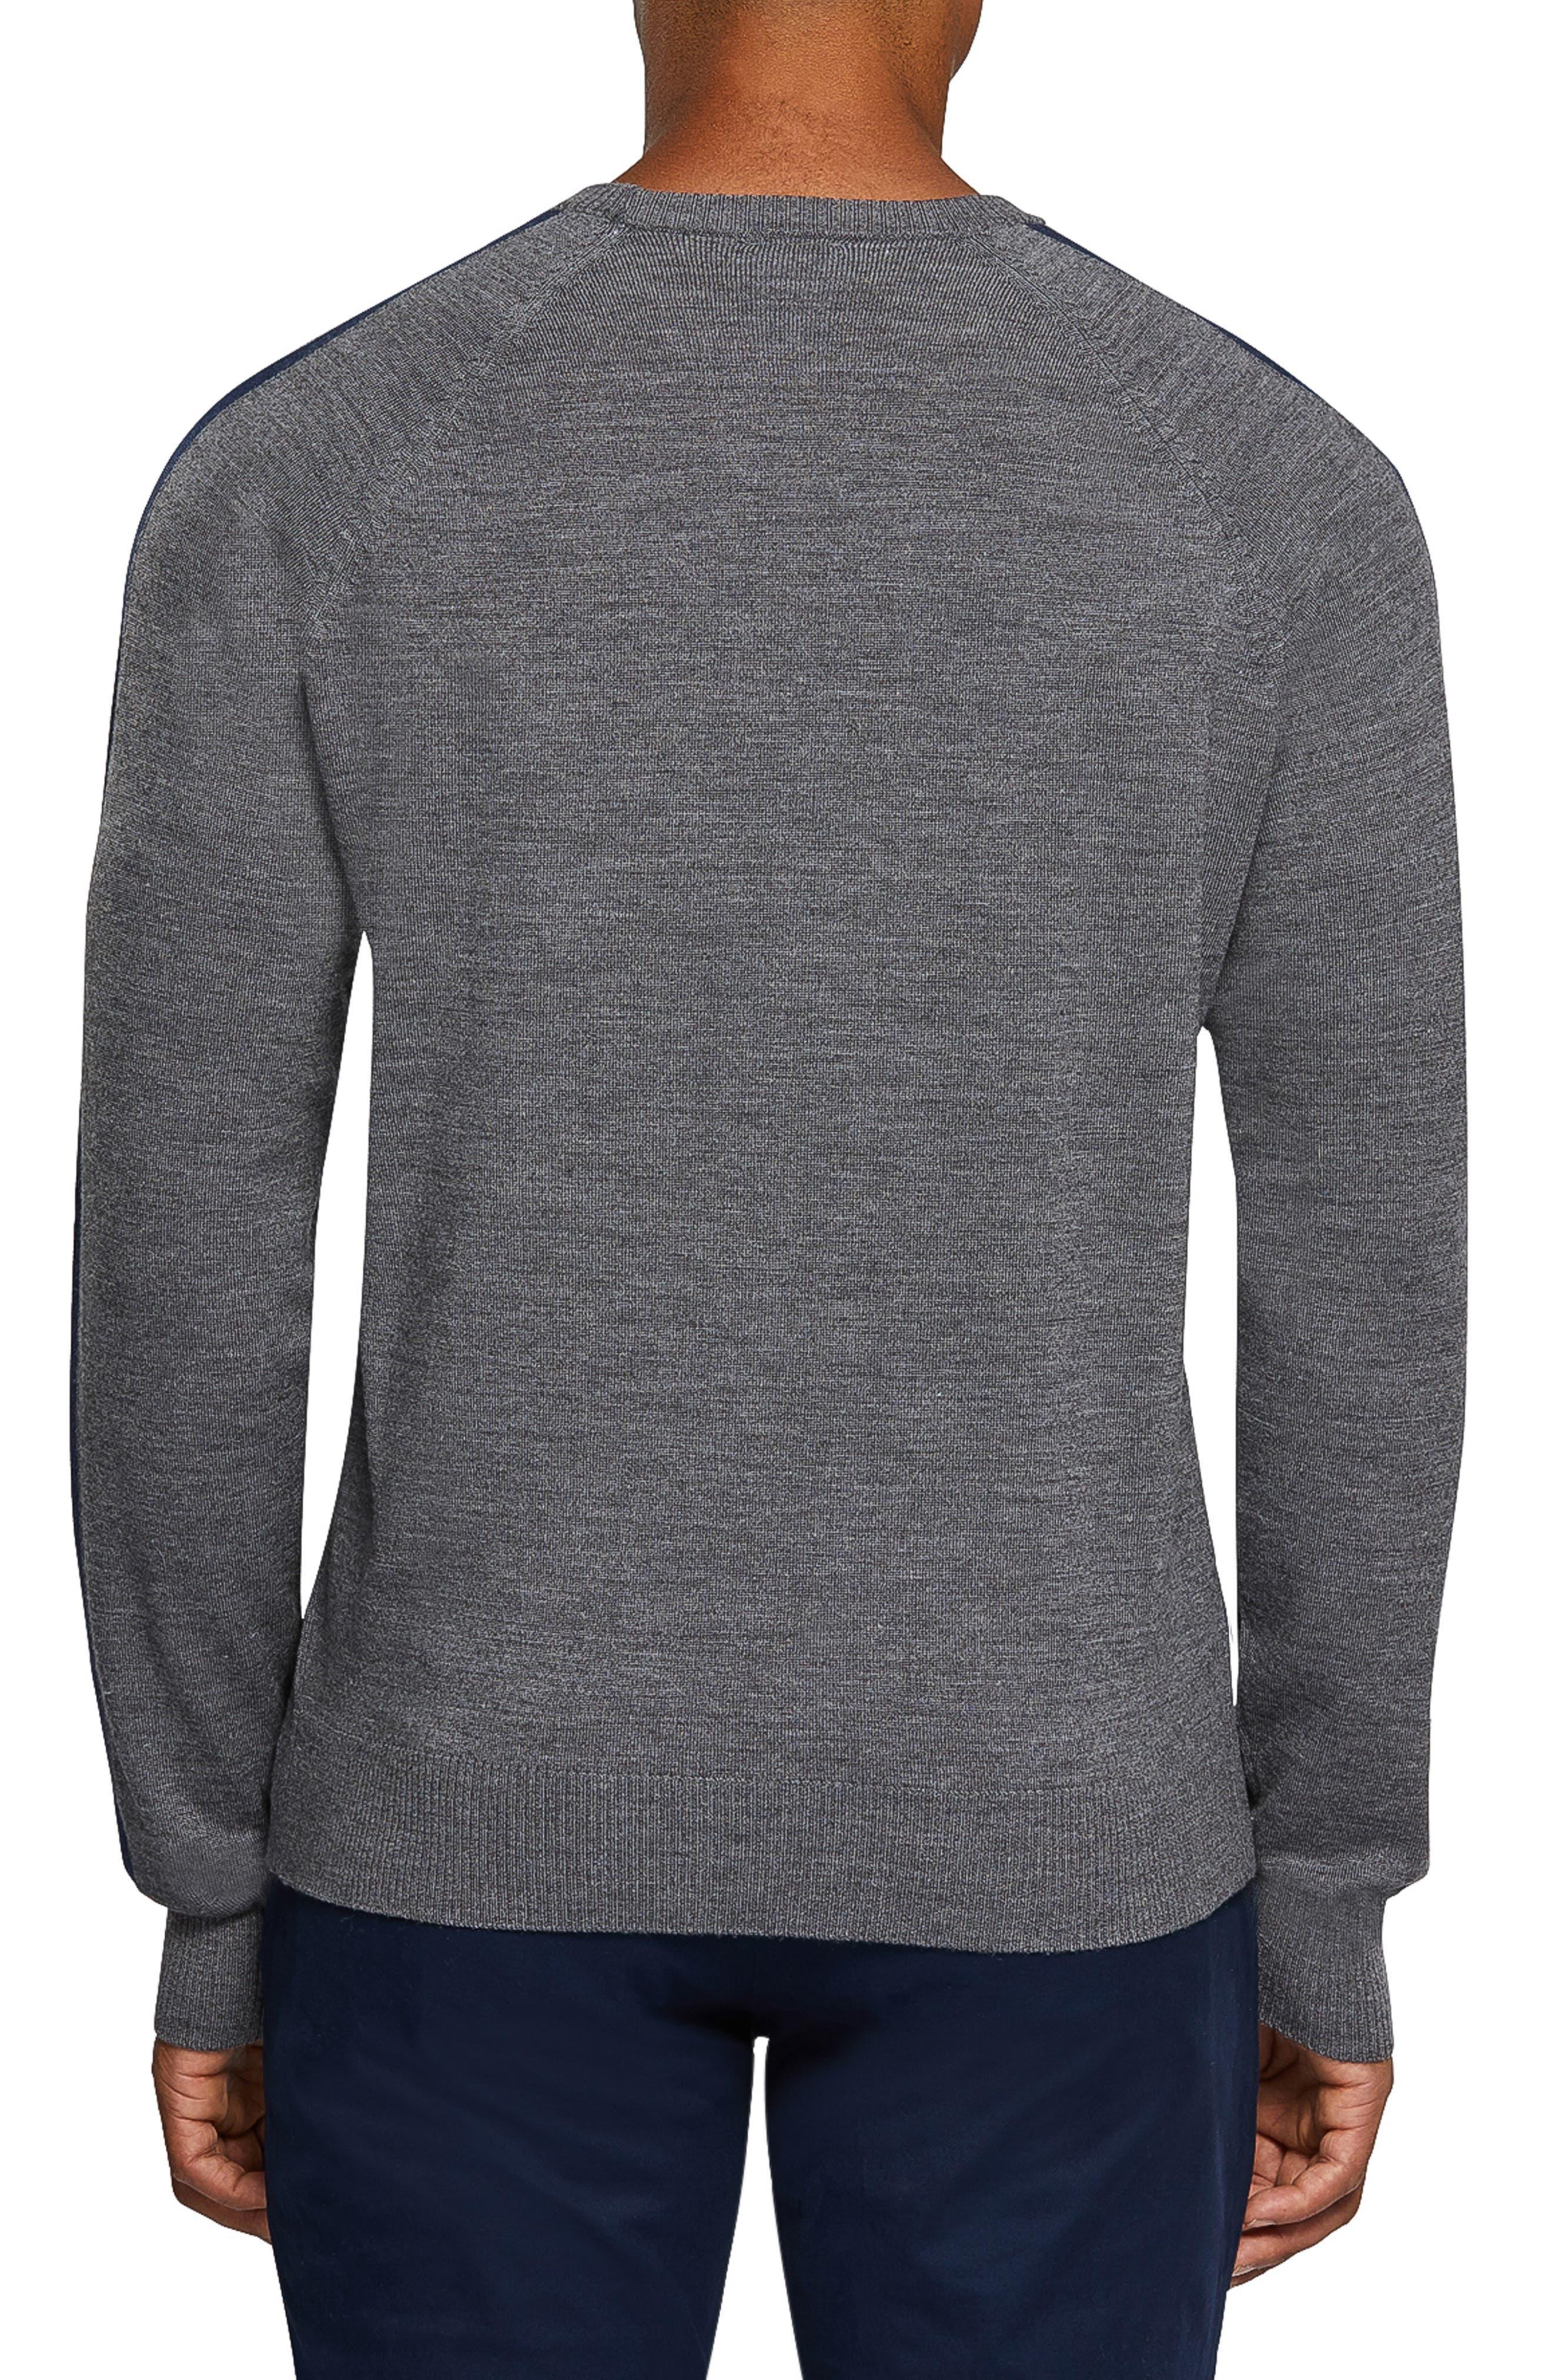 PSYCHO BUNNY,                             Raglan Merino Wool Sweater,                             Alternate thumbnail 2, color,                             HEATHER GREY